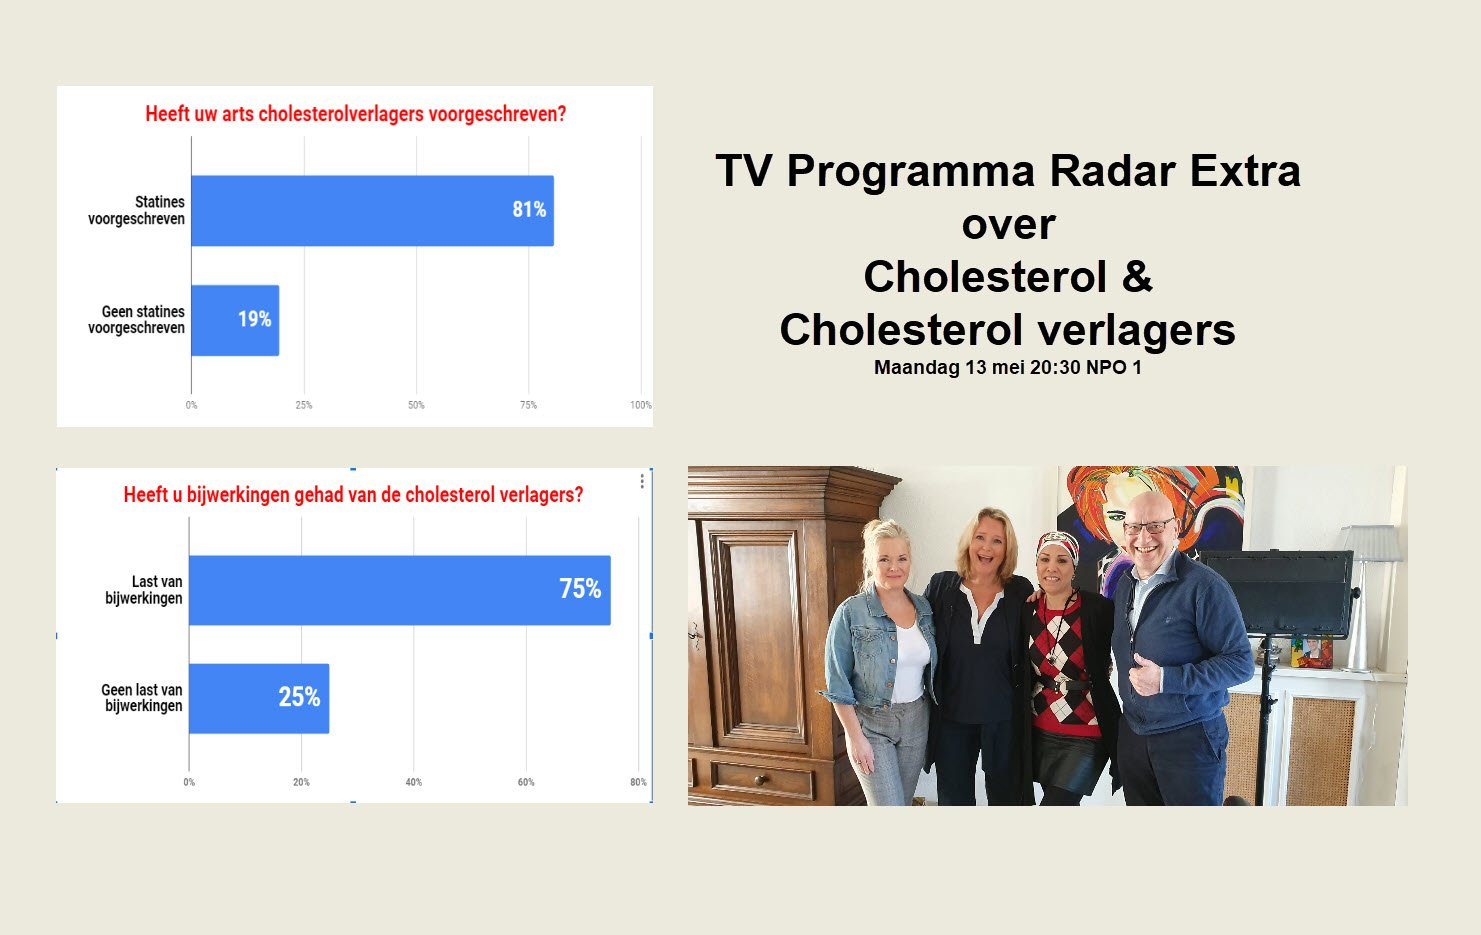 TV programma Radar bijwerkingen Cholesterolverlagers